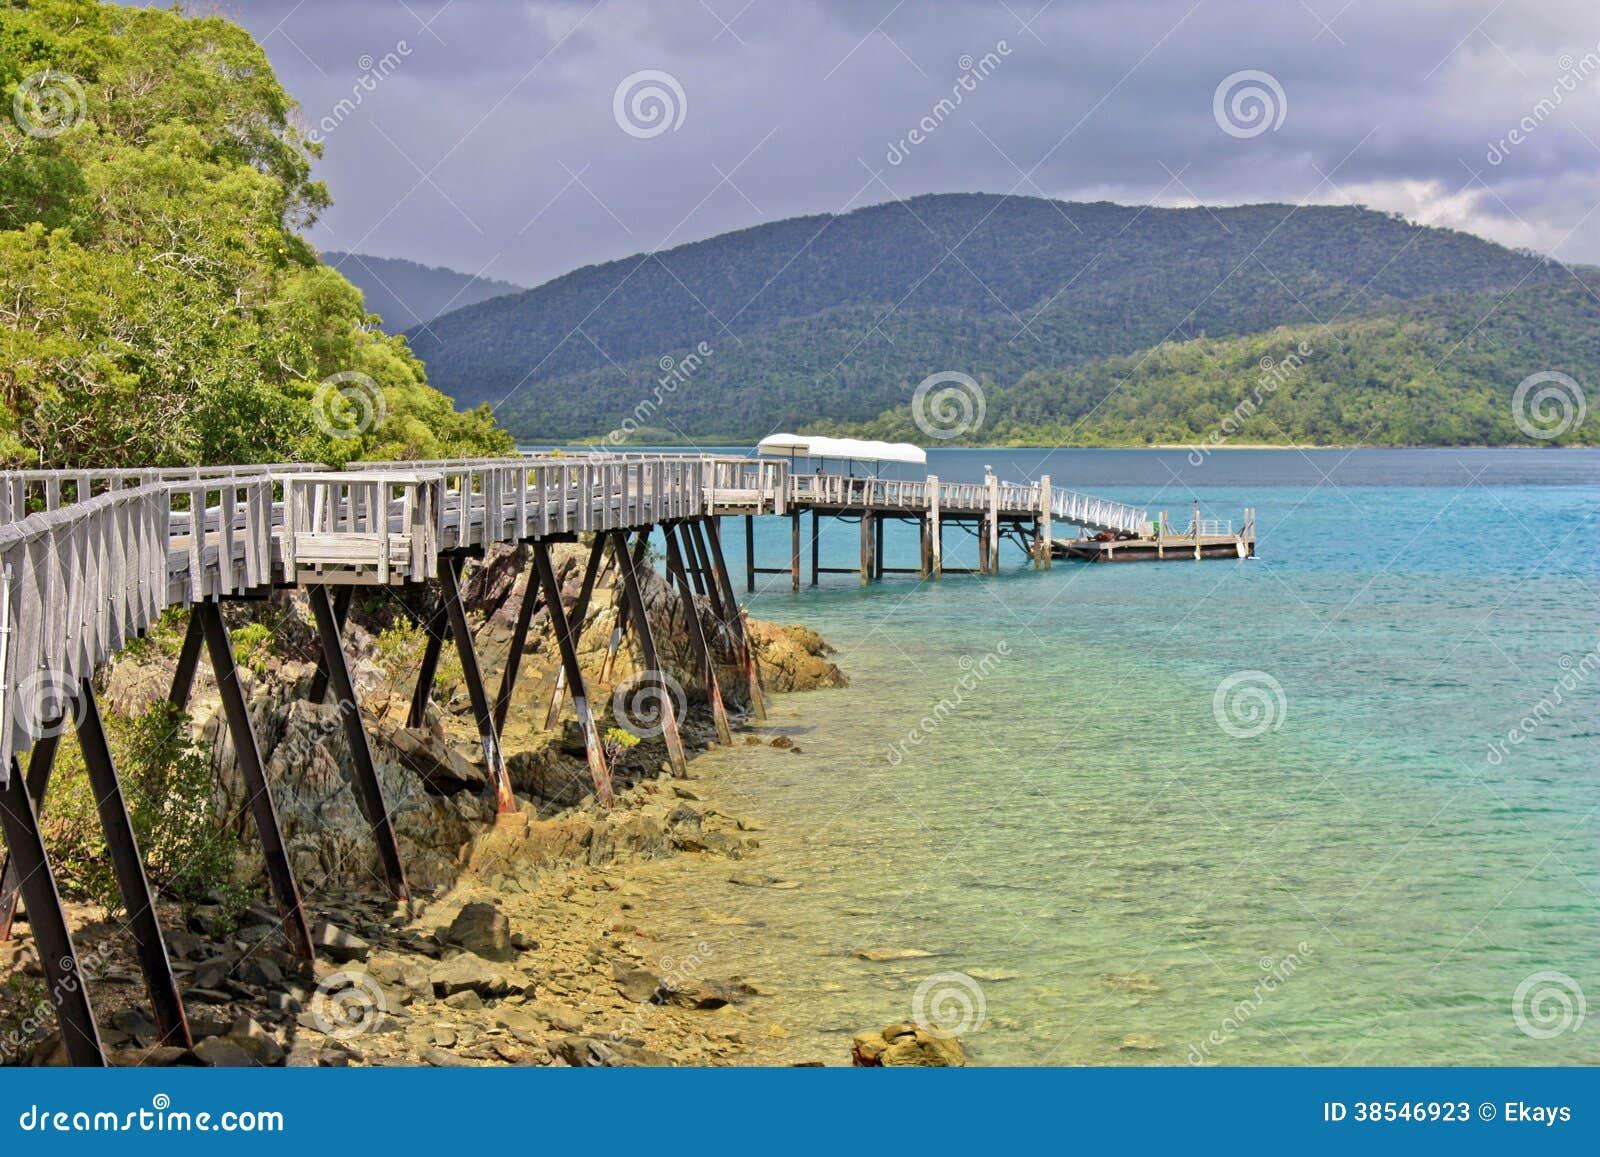 Long Island Whitsundays Queensland